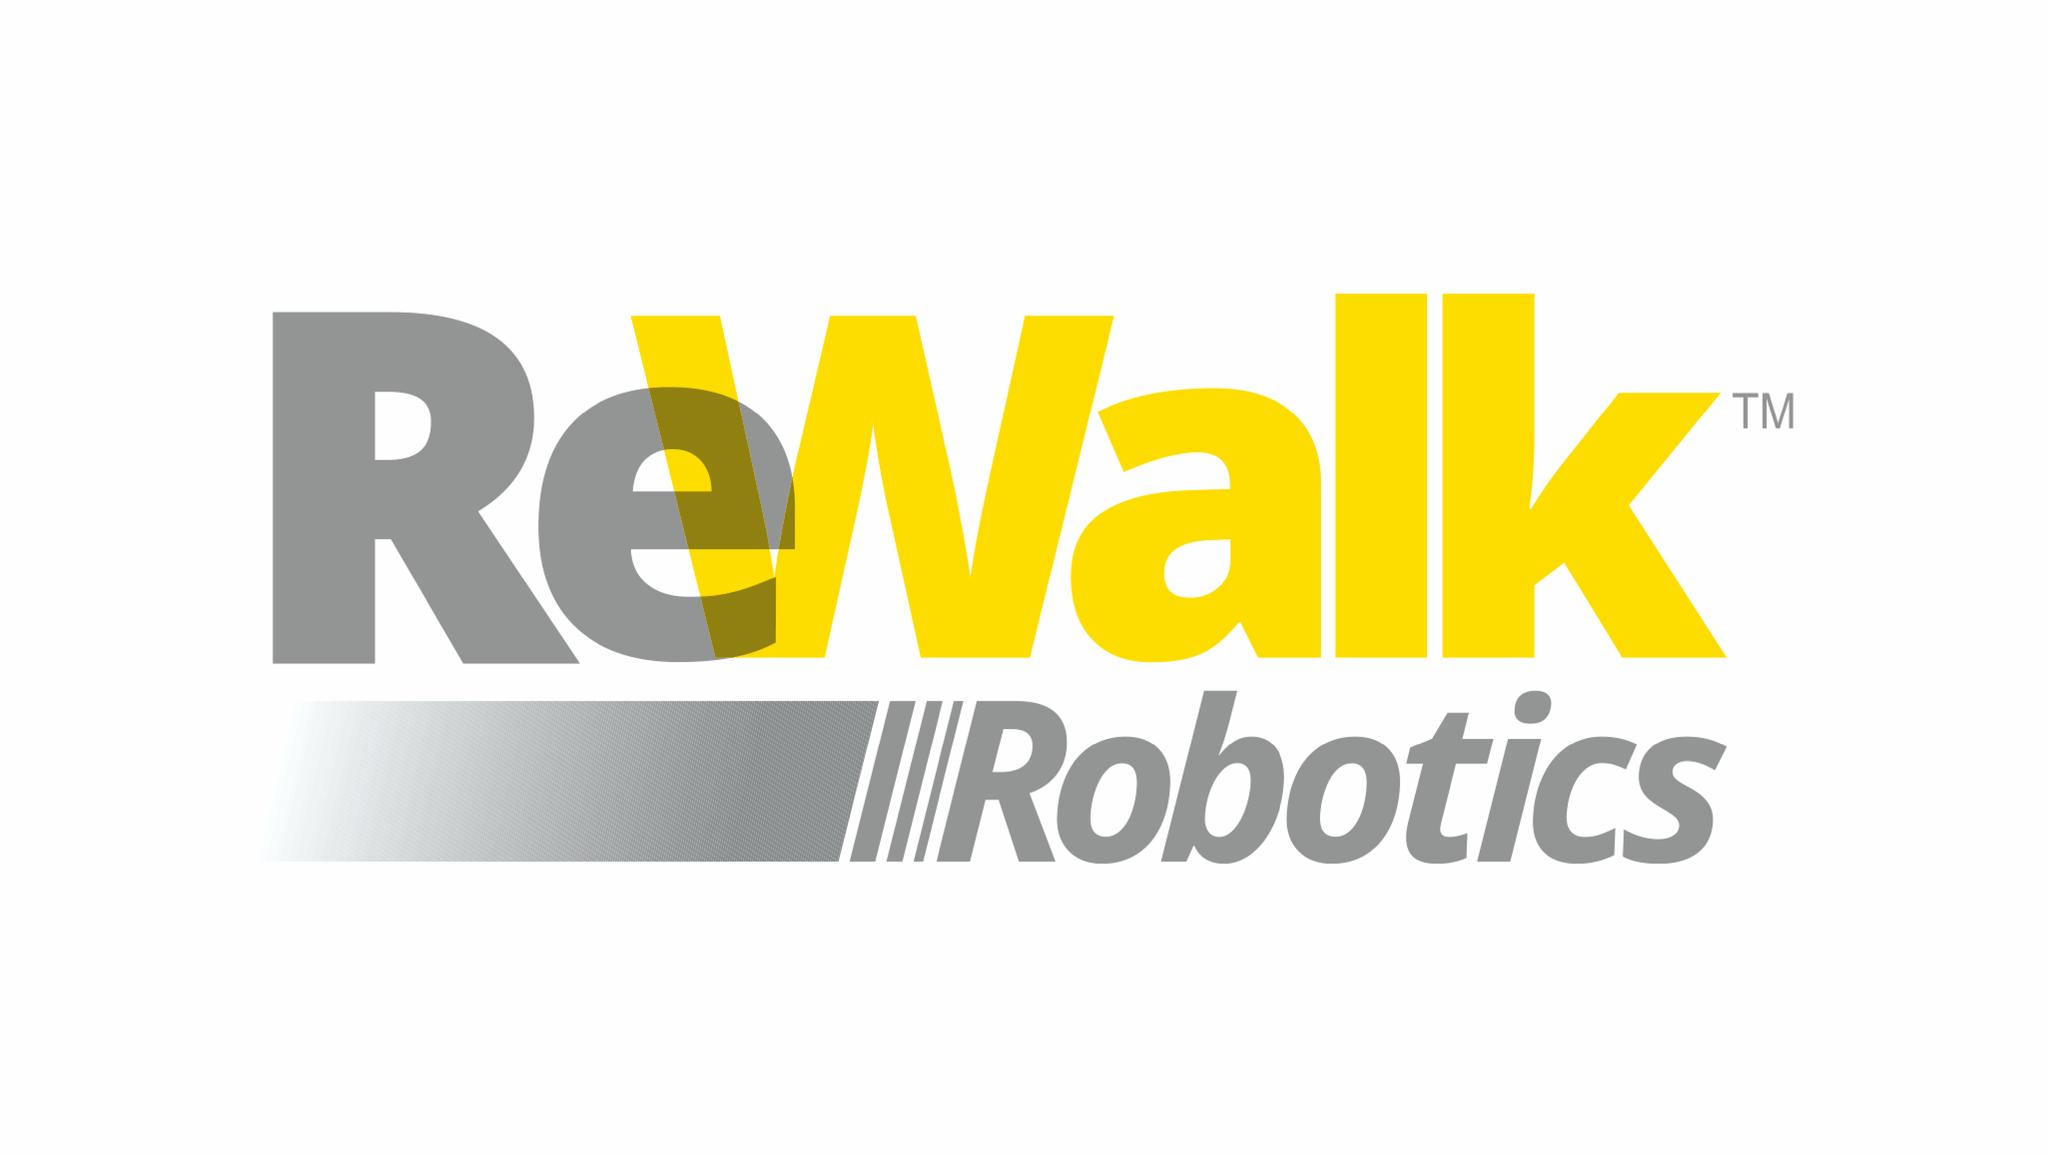 Rewalk Robotics